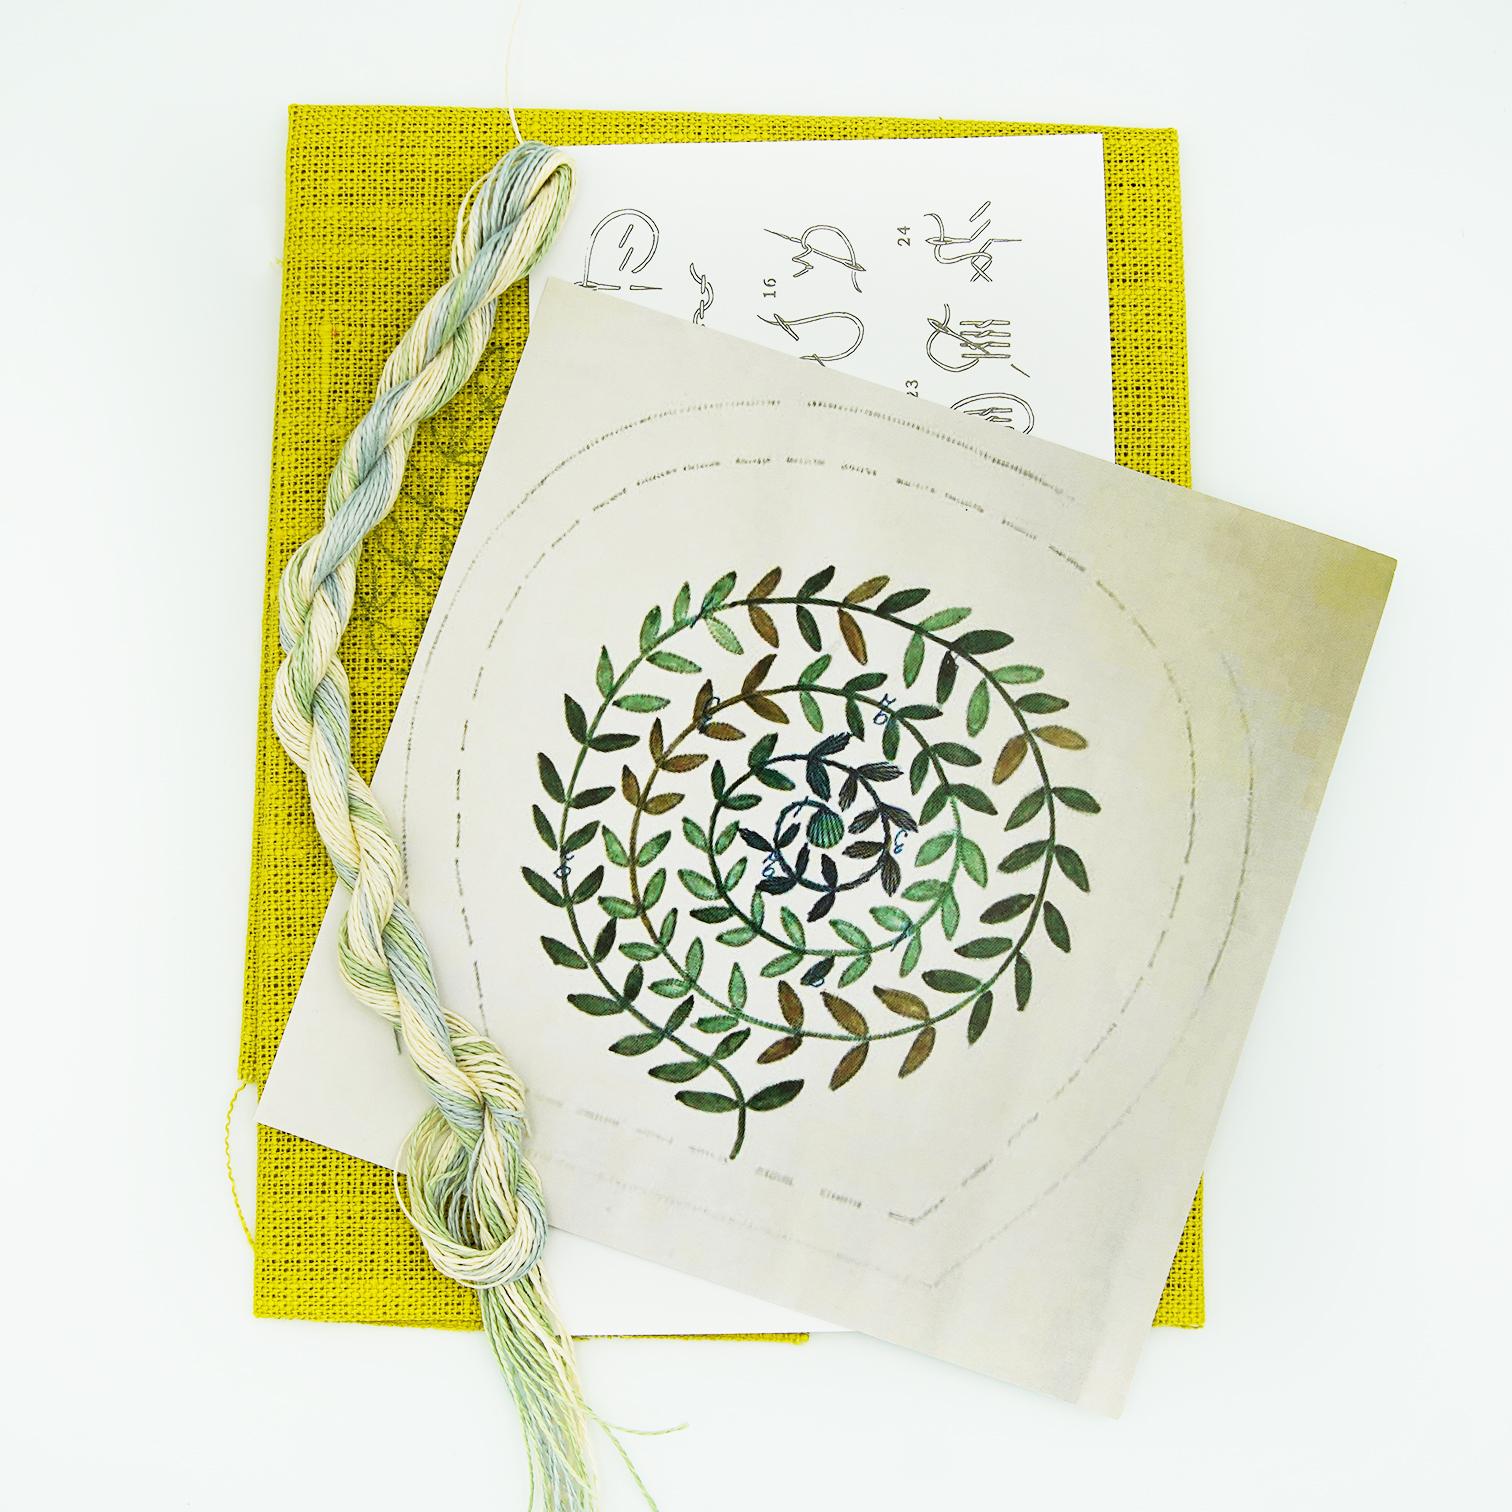 Linladan - Leaf Swirl 6502 - Swedish Embroidery Kit 116